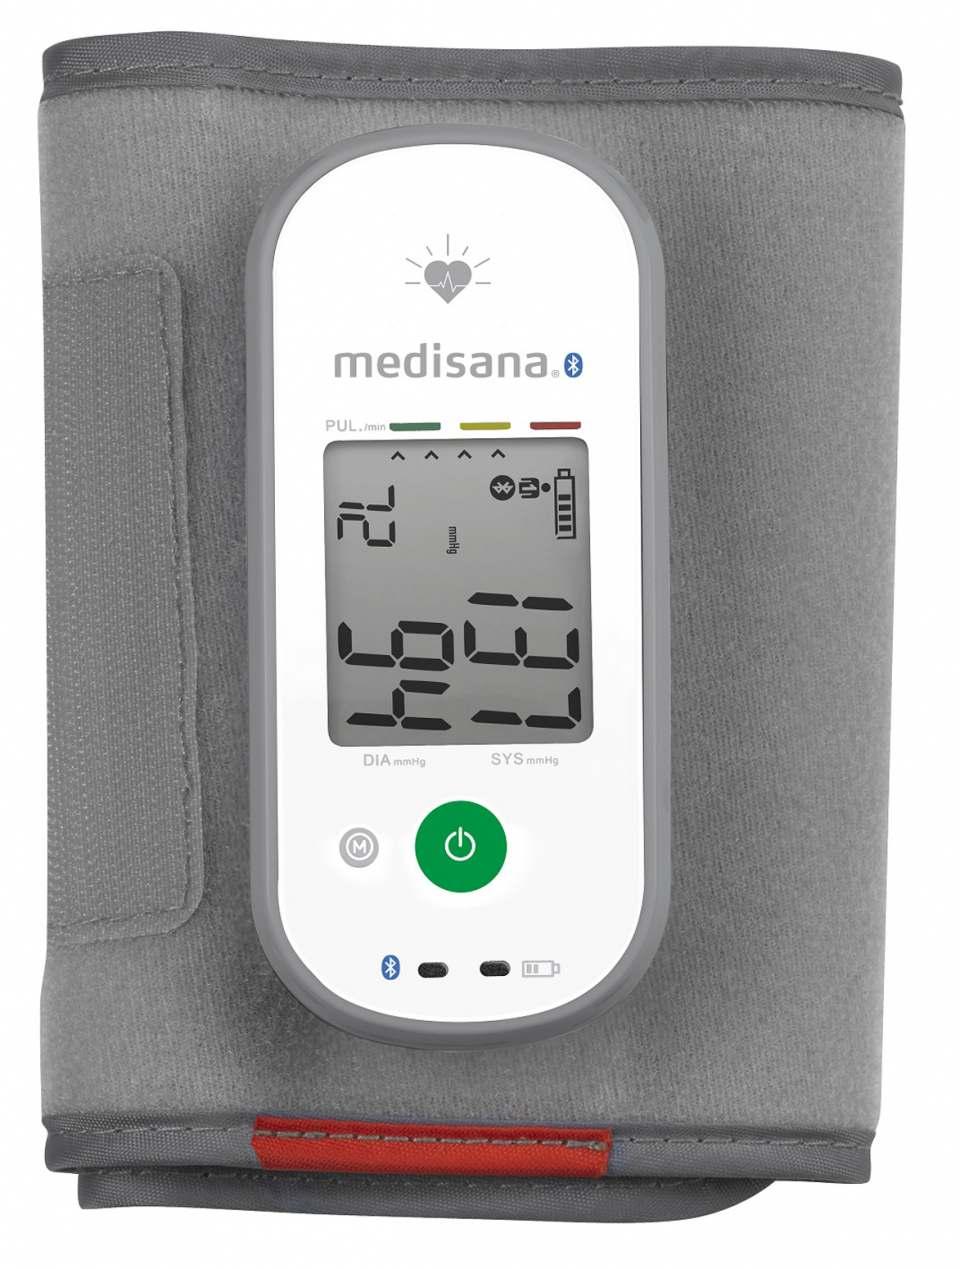 Medisana Blutdruckmessgeräte BU 560 connect mit Ruheindikator.